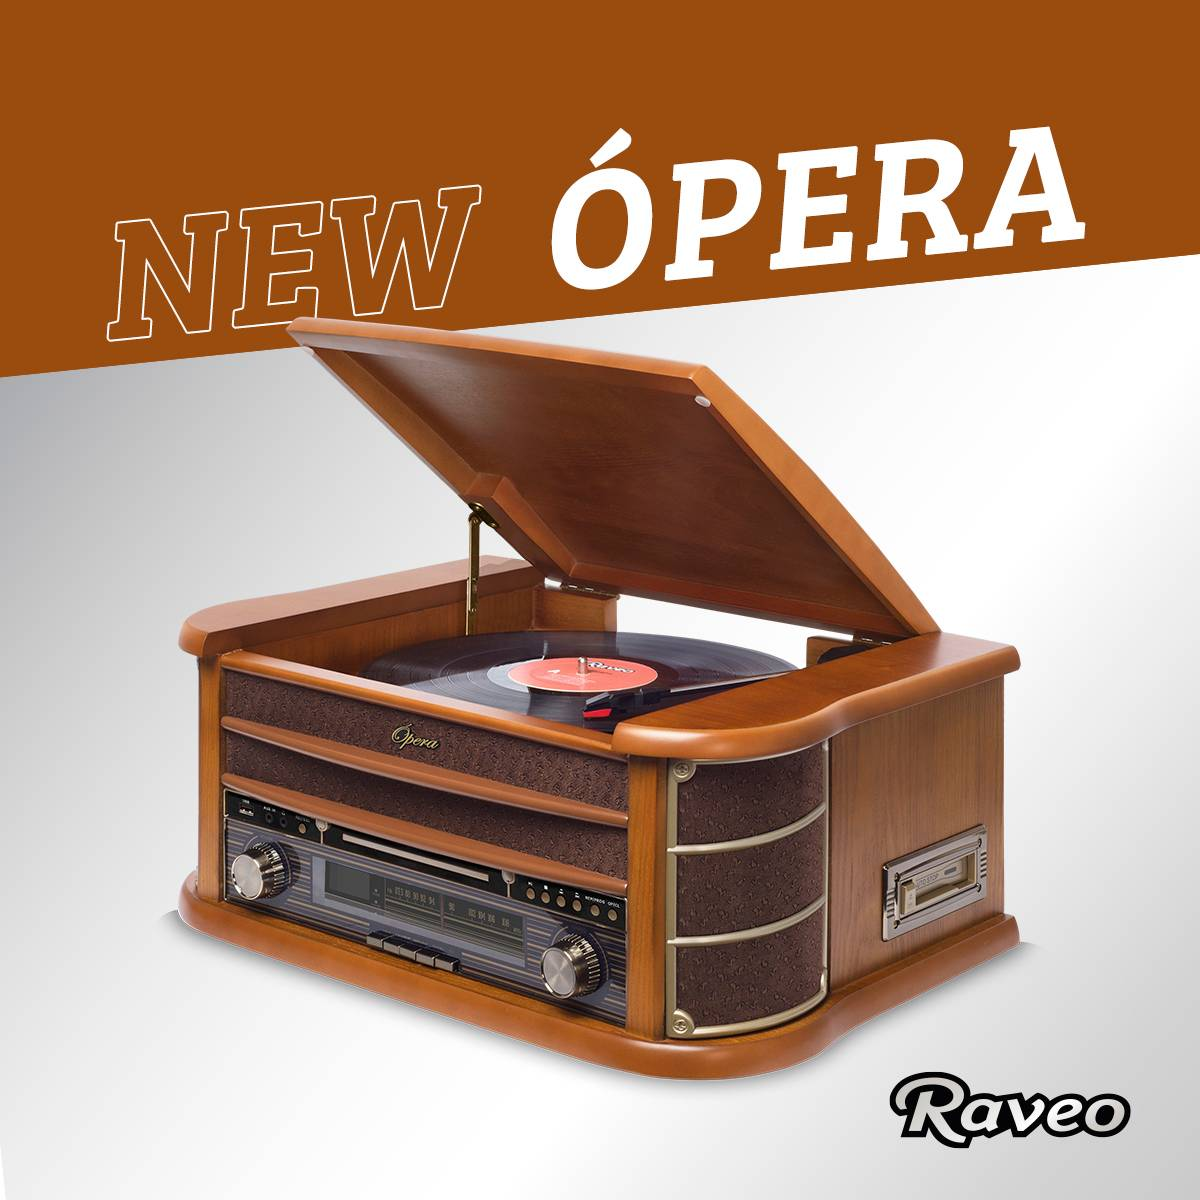 Vitrola Raveo New Opera BT com Bluetooth, Toca Discos, CD, FM, Fita K7, AUX, Converte Vinil e K7 em USB